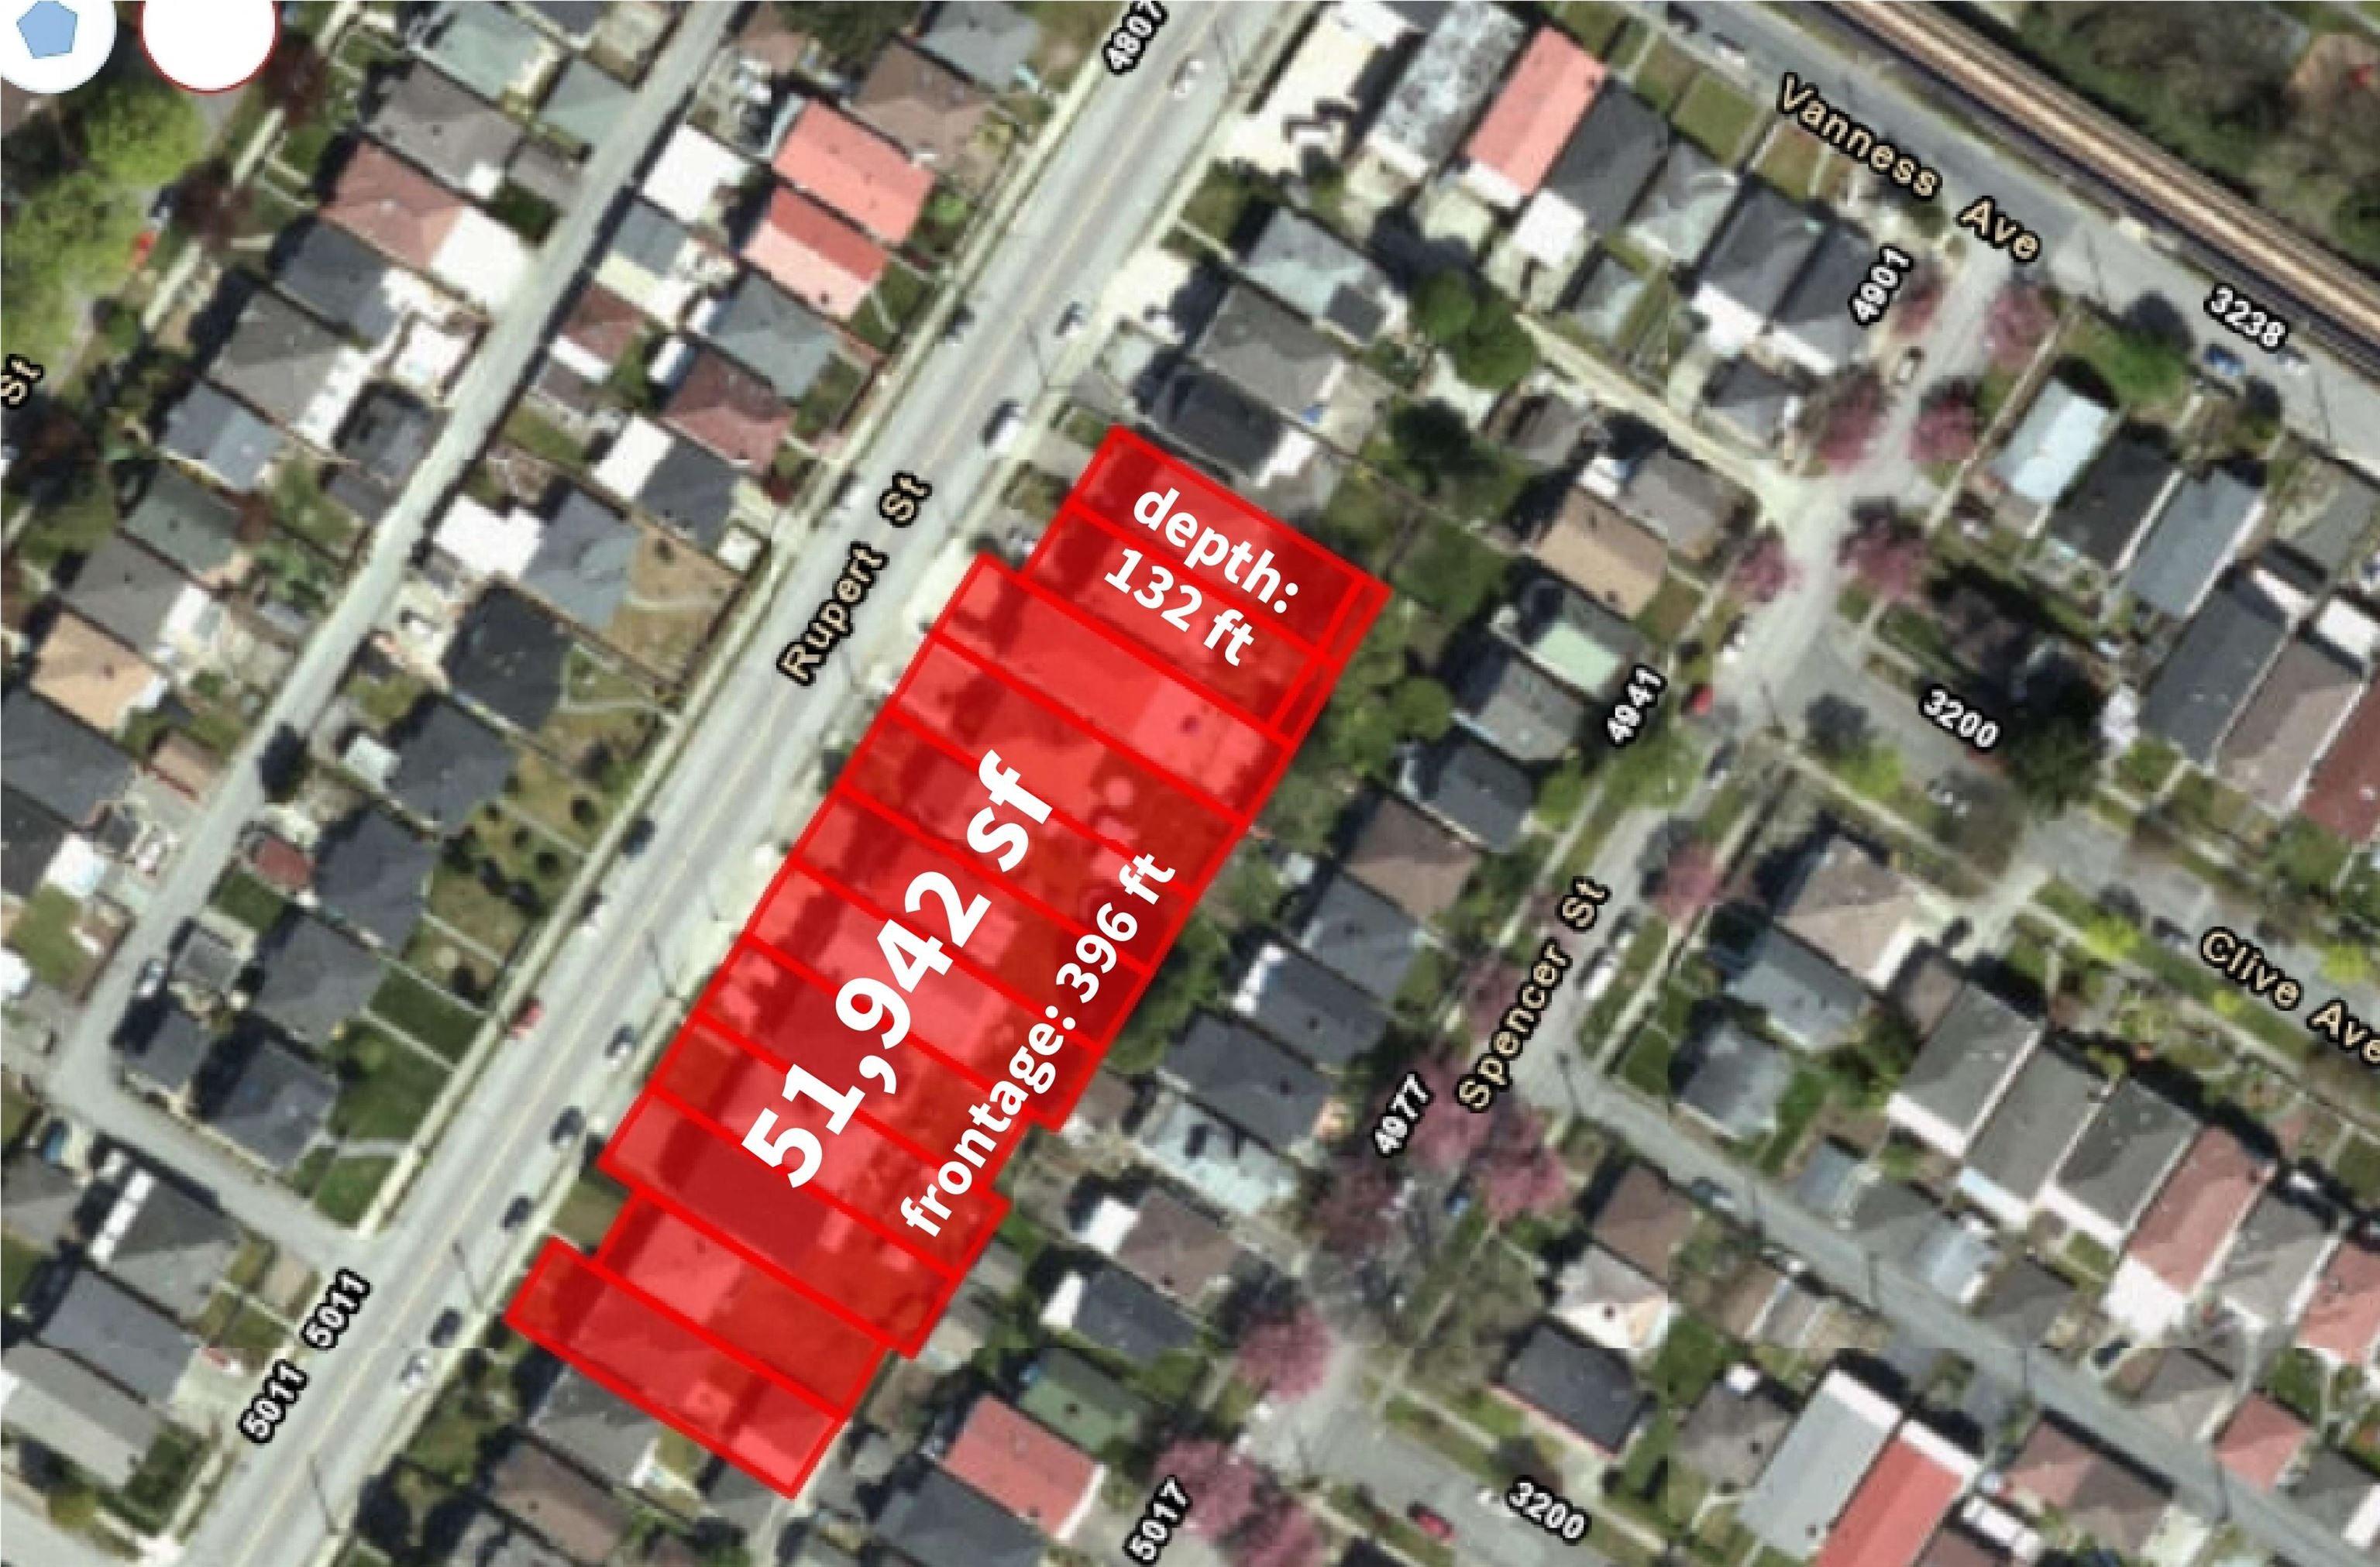 4970 RUPERT STREET - Collingwood VE House/Single Family for sale, 5 Bedrooms (R2543690) - #1